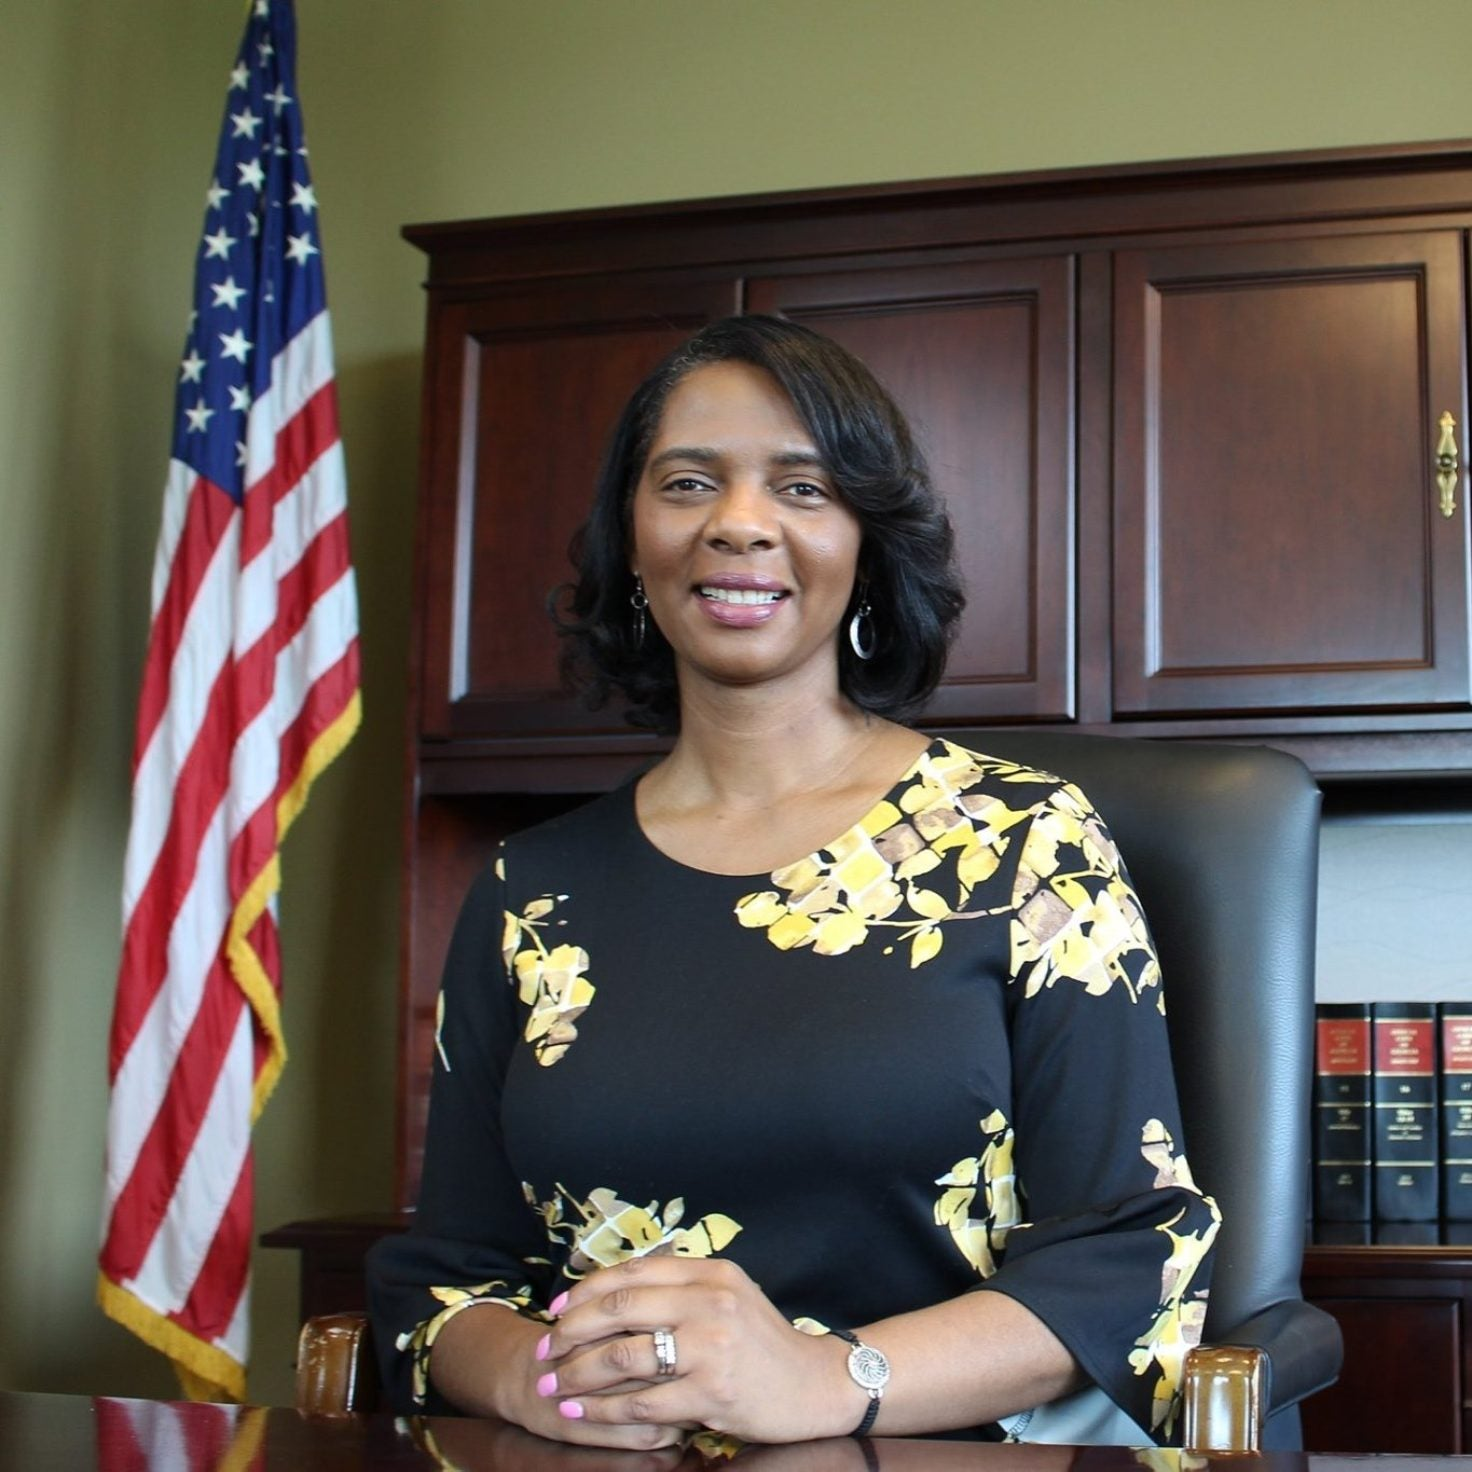 Cobb County DA Appointed To Arbery Case Following News Of DOJ Probe